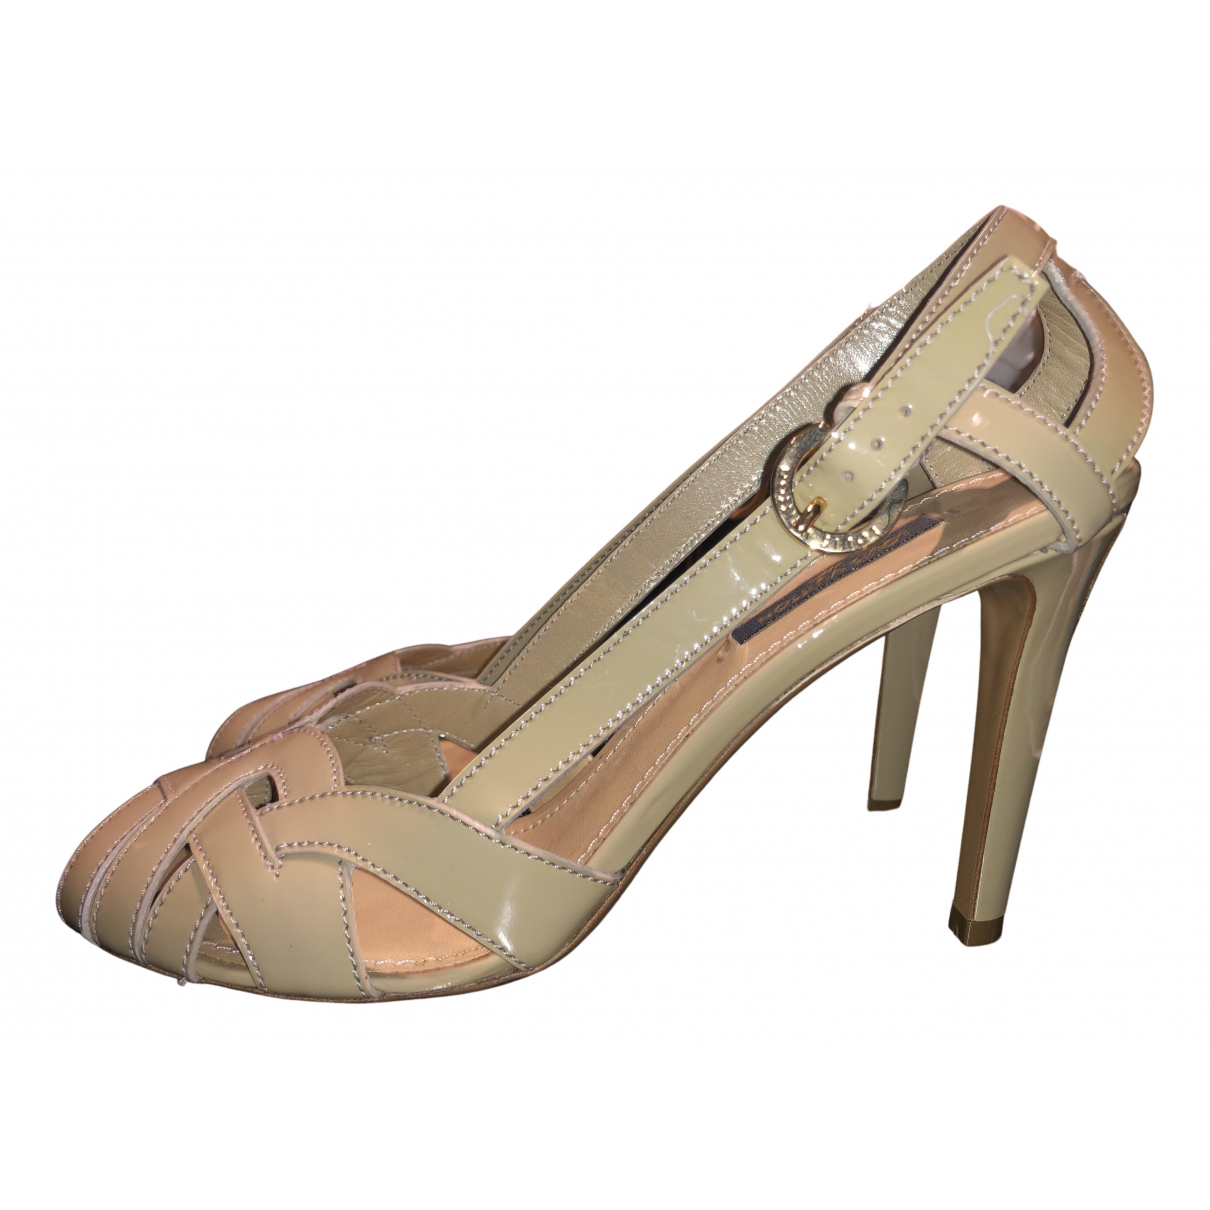 Louis Vuitton N Beige Patent leather Sandals for Women 37 EU